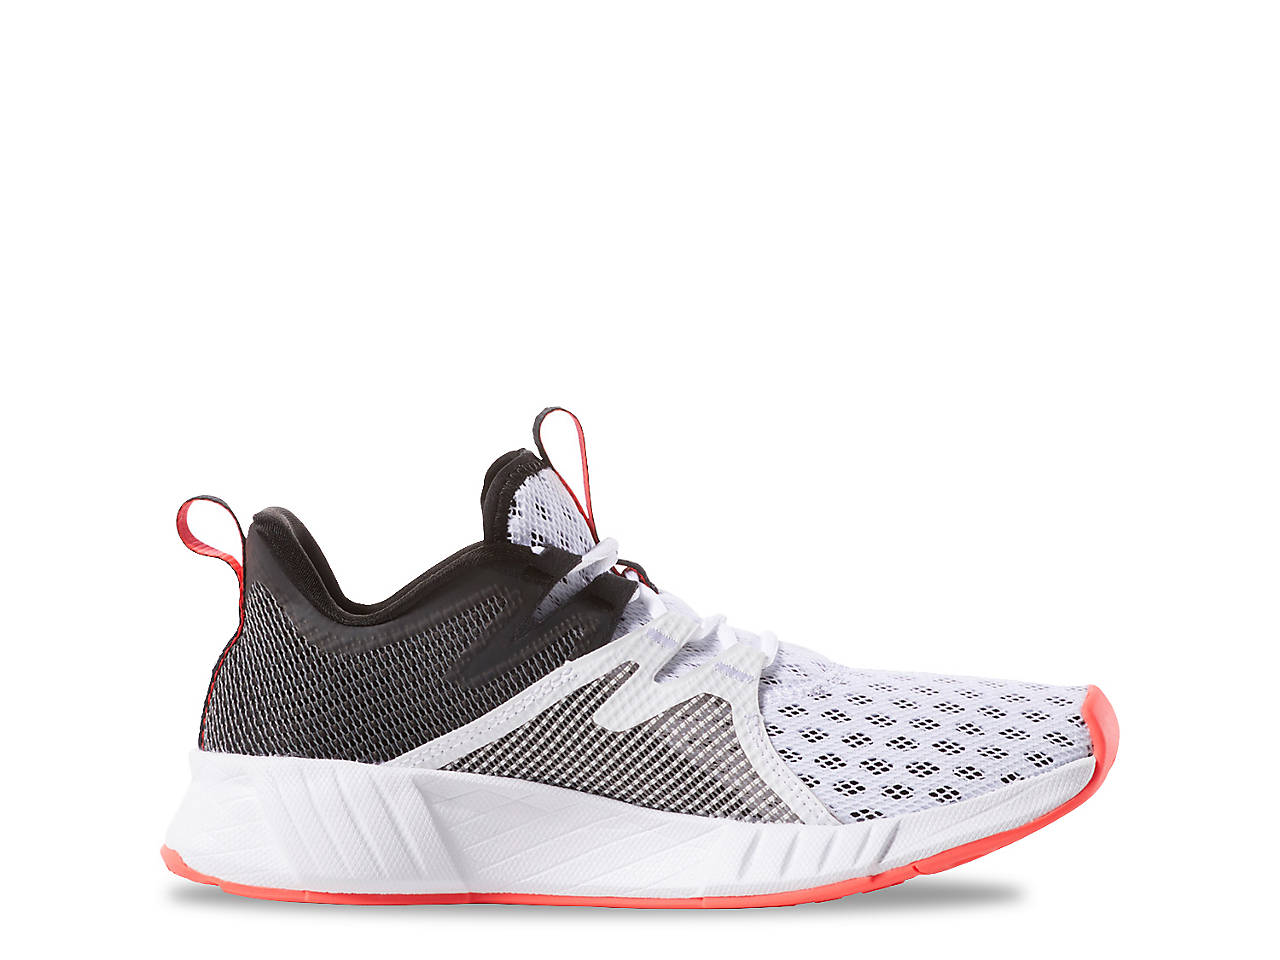 6159ac11aa Fusium Run 2.0 Running Shoe - Women's